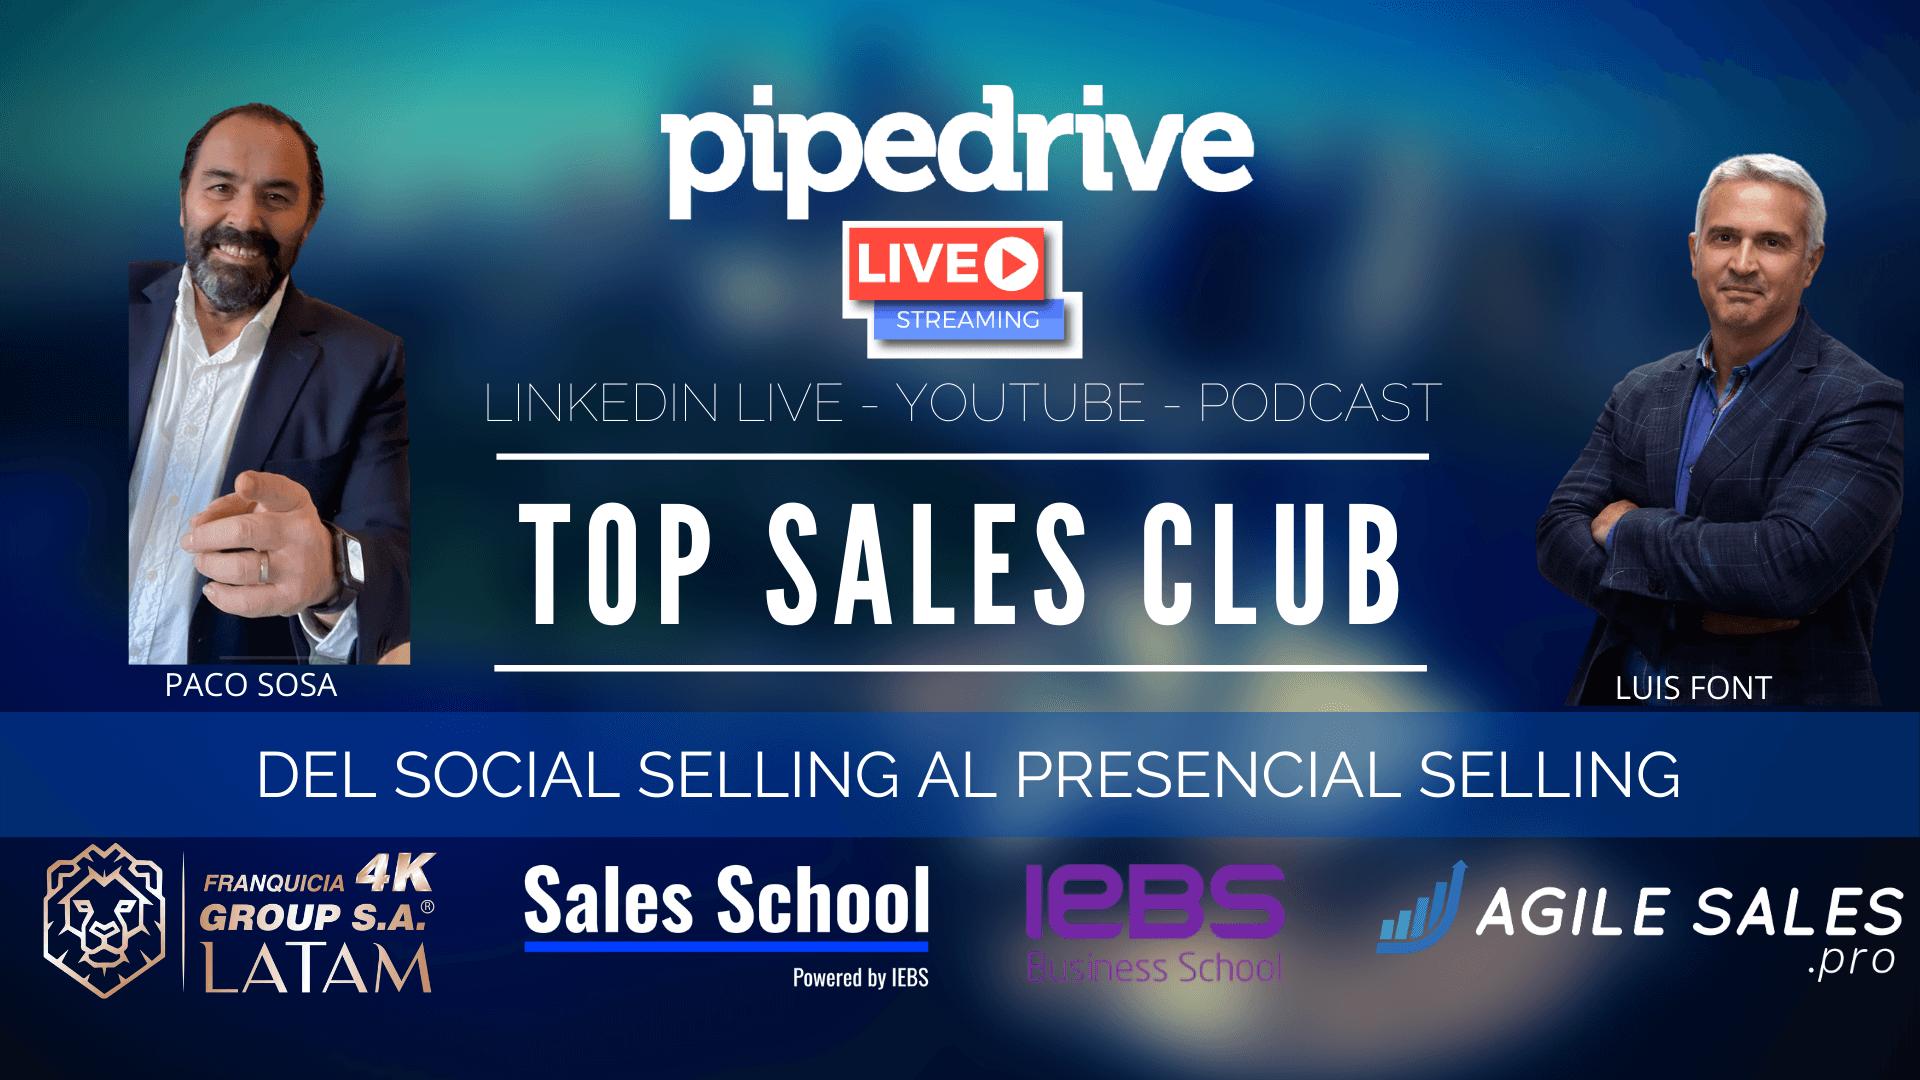 Del Social Selling al Presencial Selling